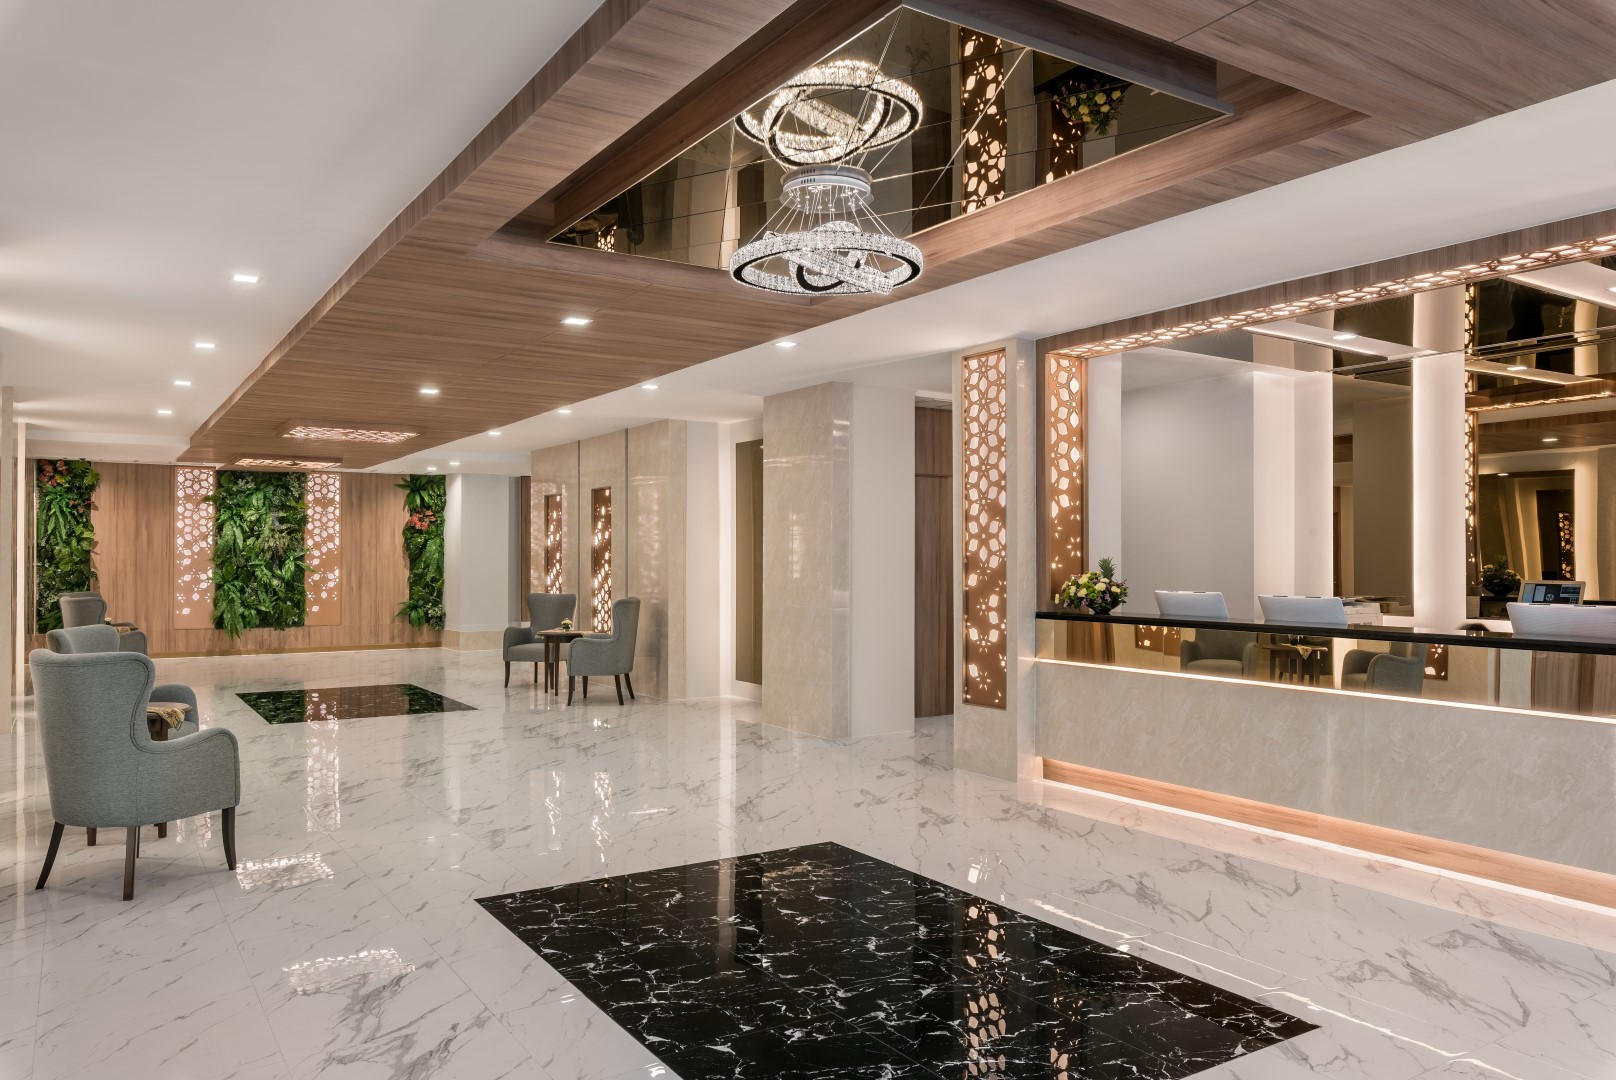 Adelphi Grande Sukhumvit Hotel 20191007 - Looby A (Large).jpg